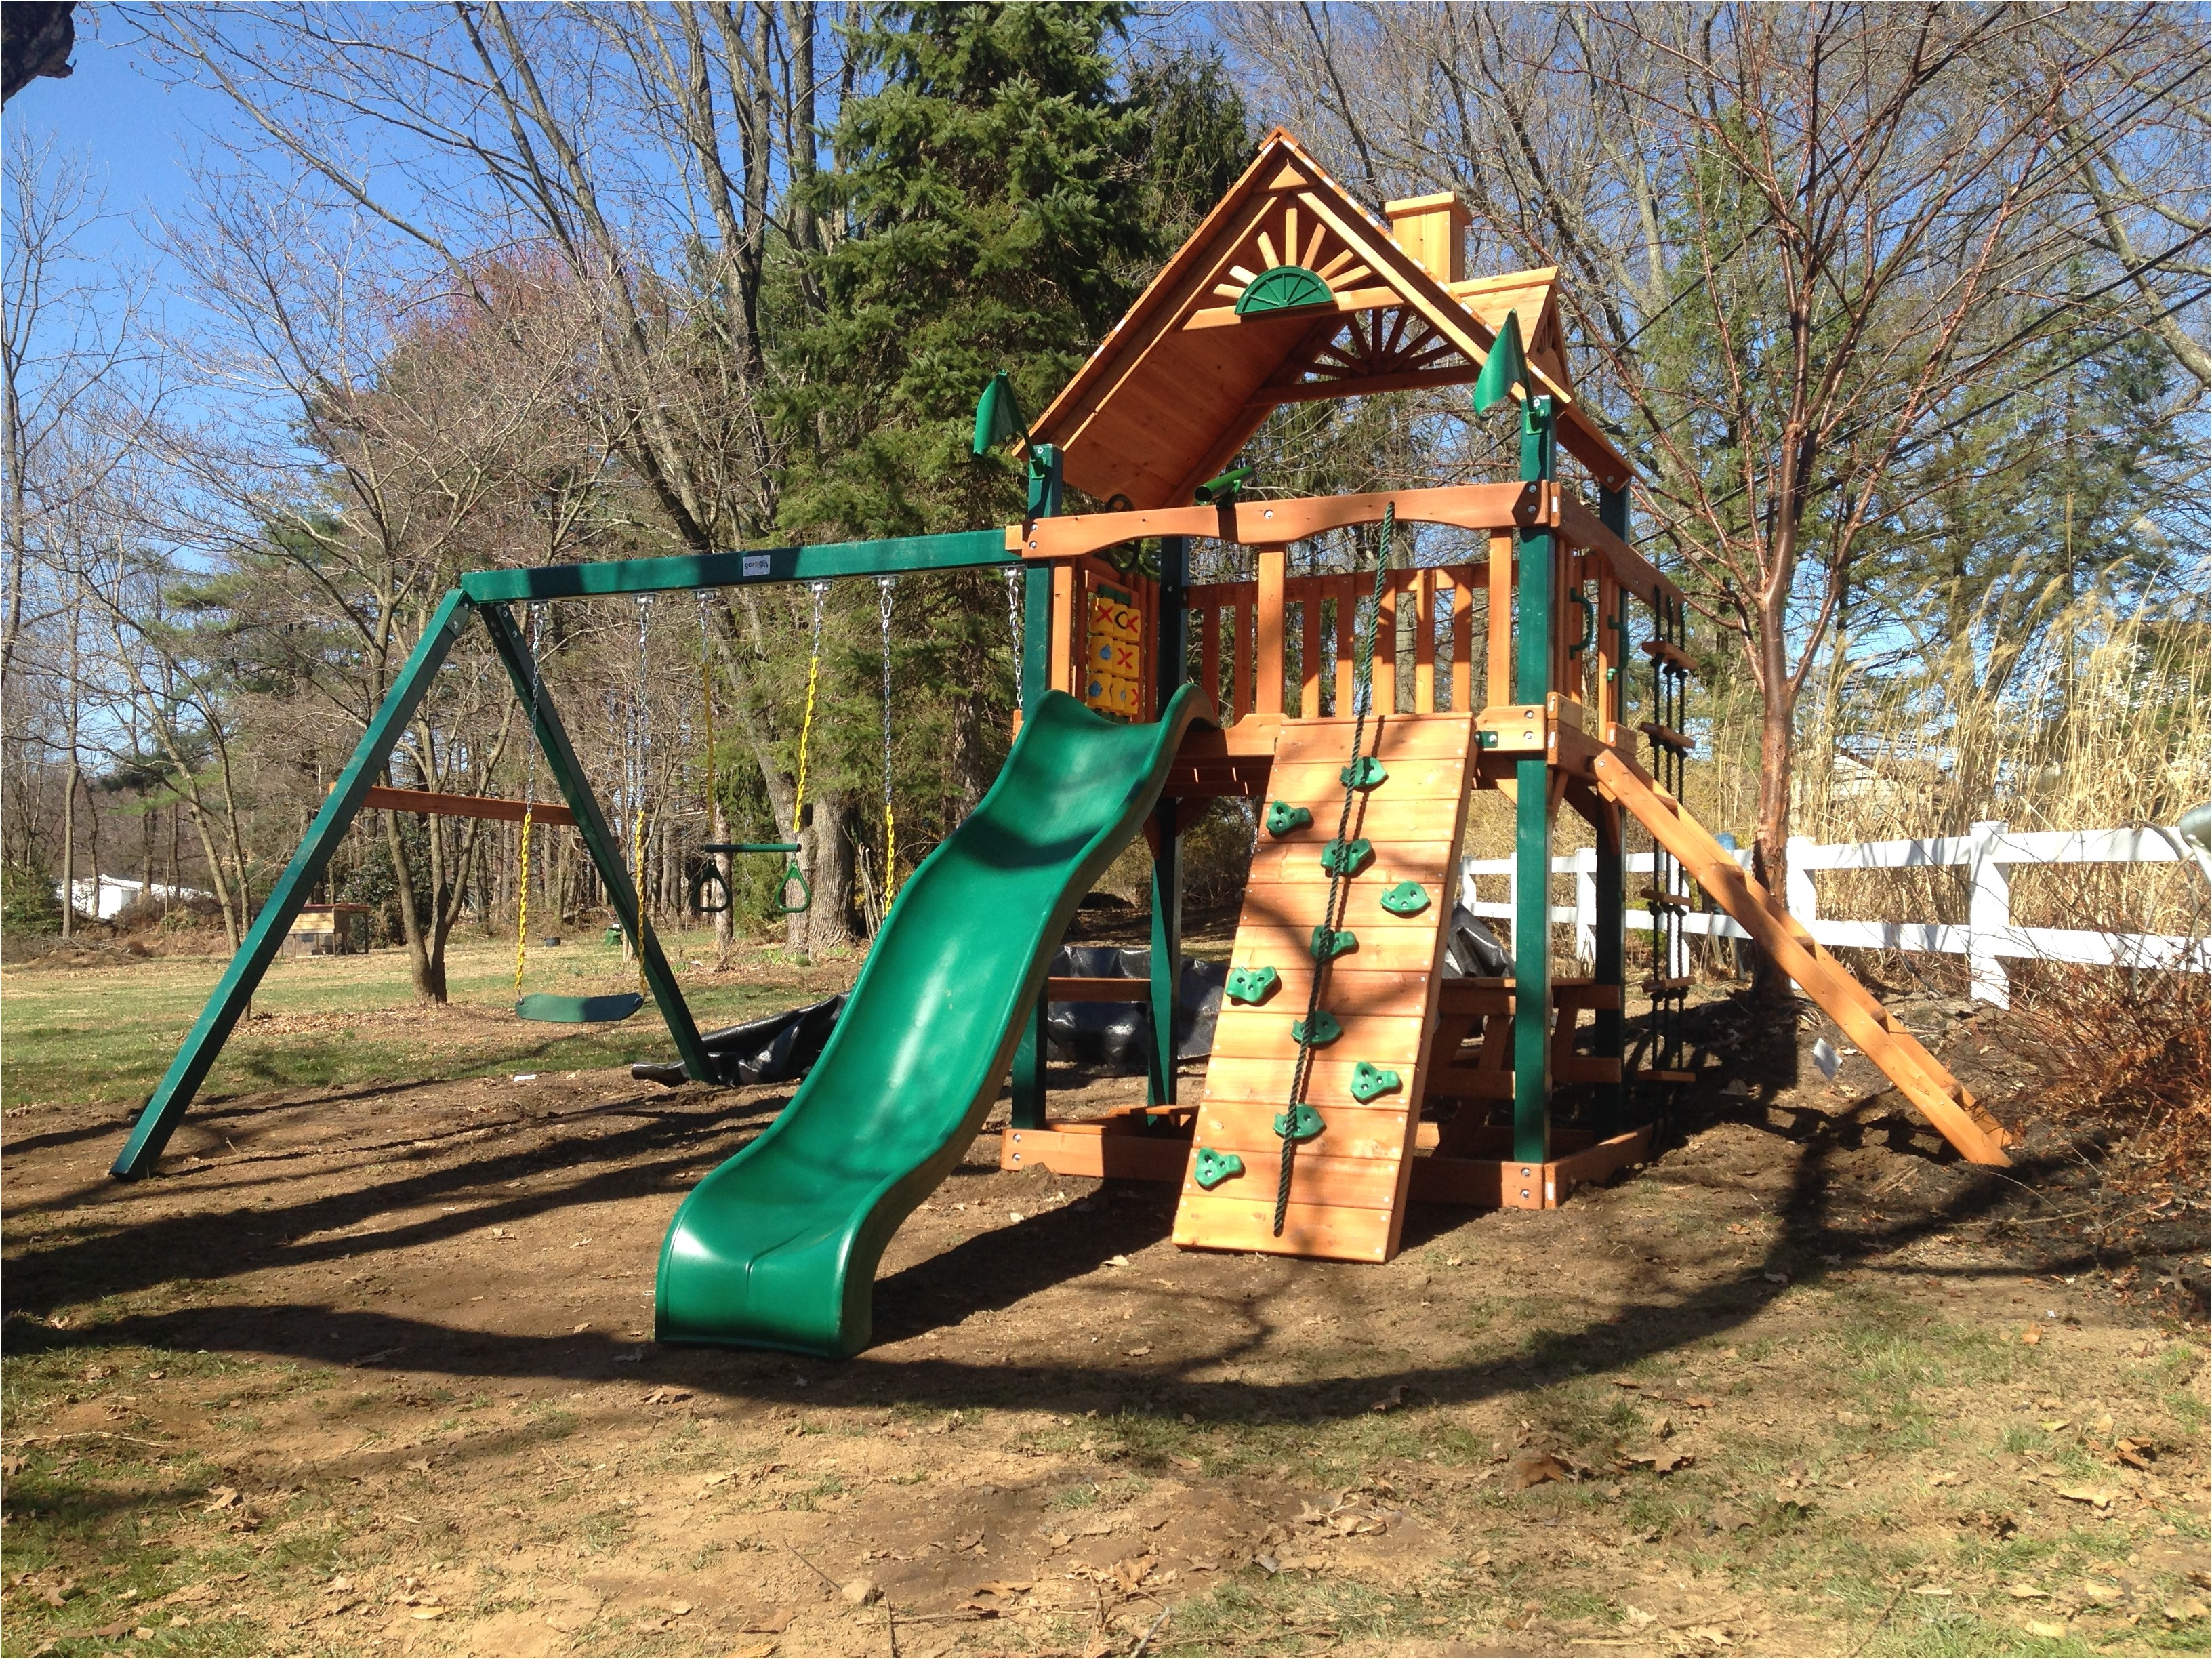 backyard swing sets walmart backyard playground swing sets tag archives whiskeyyourway deco insp